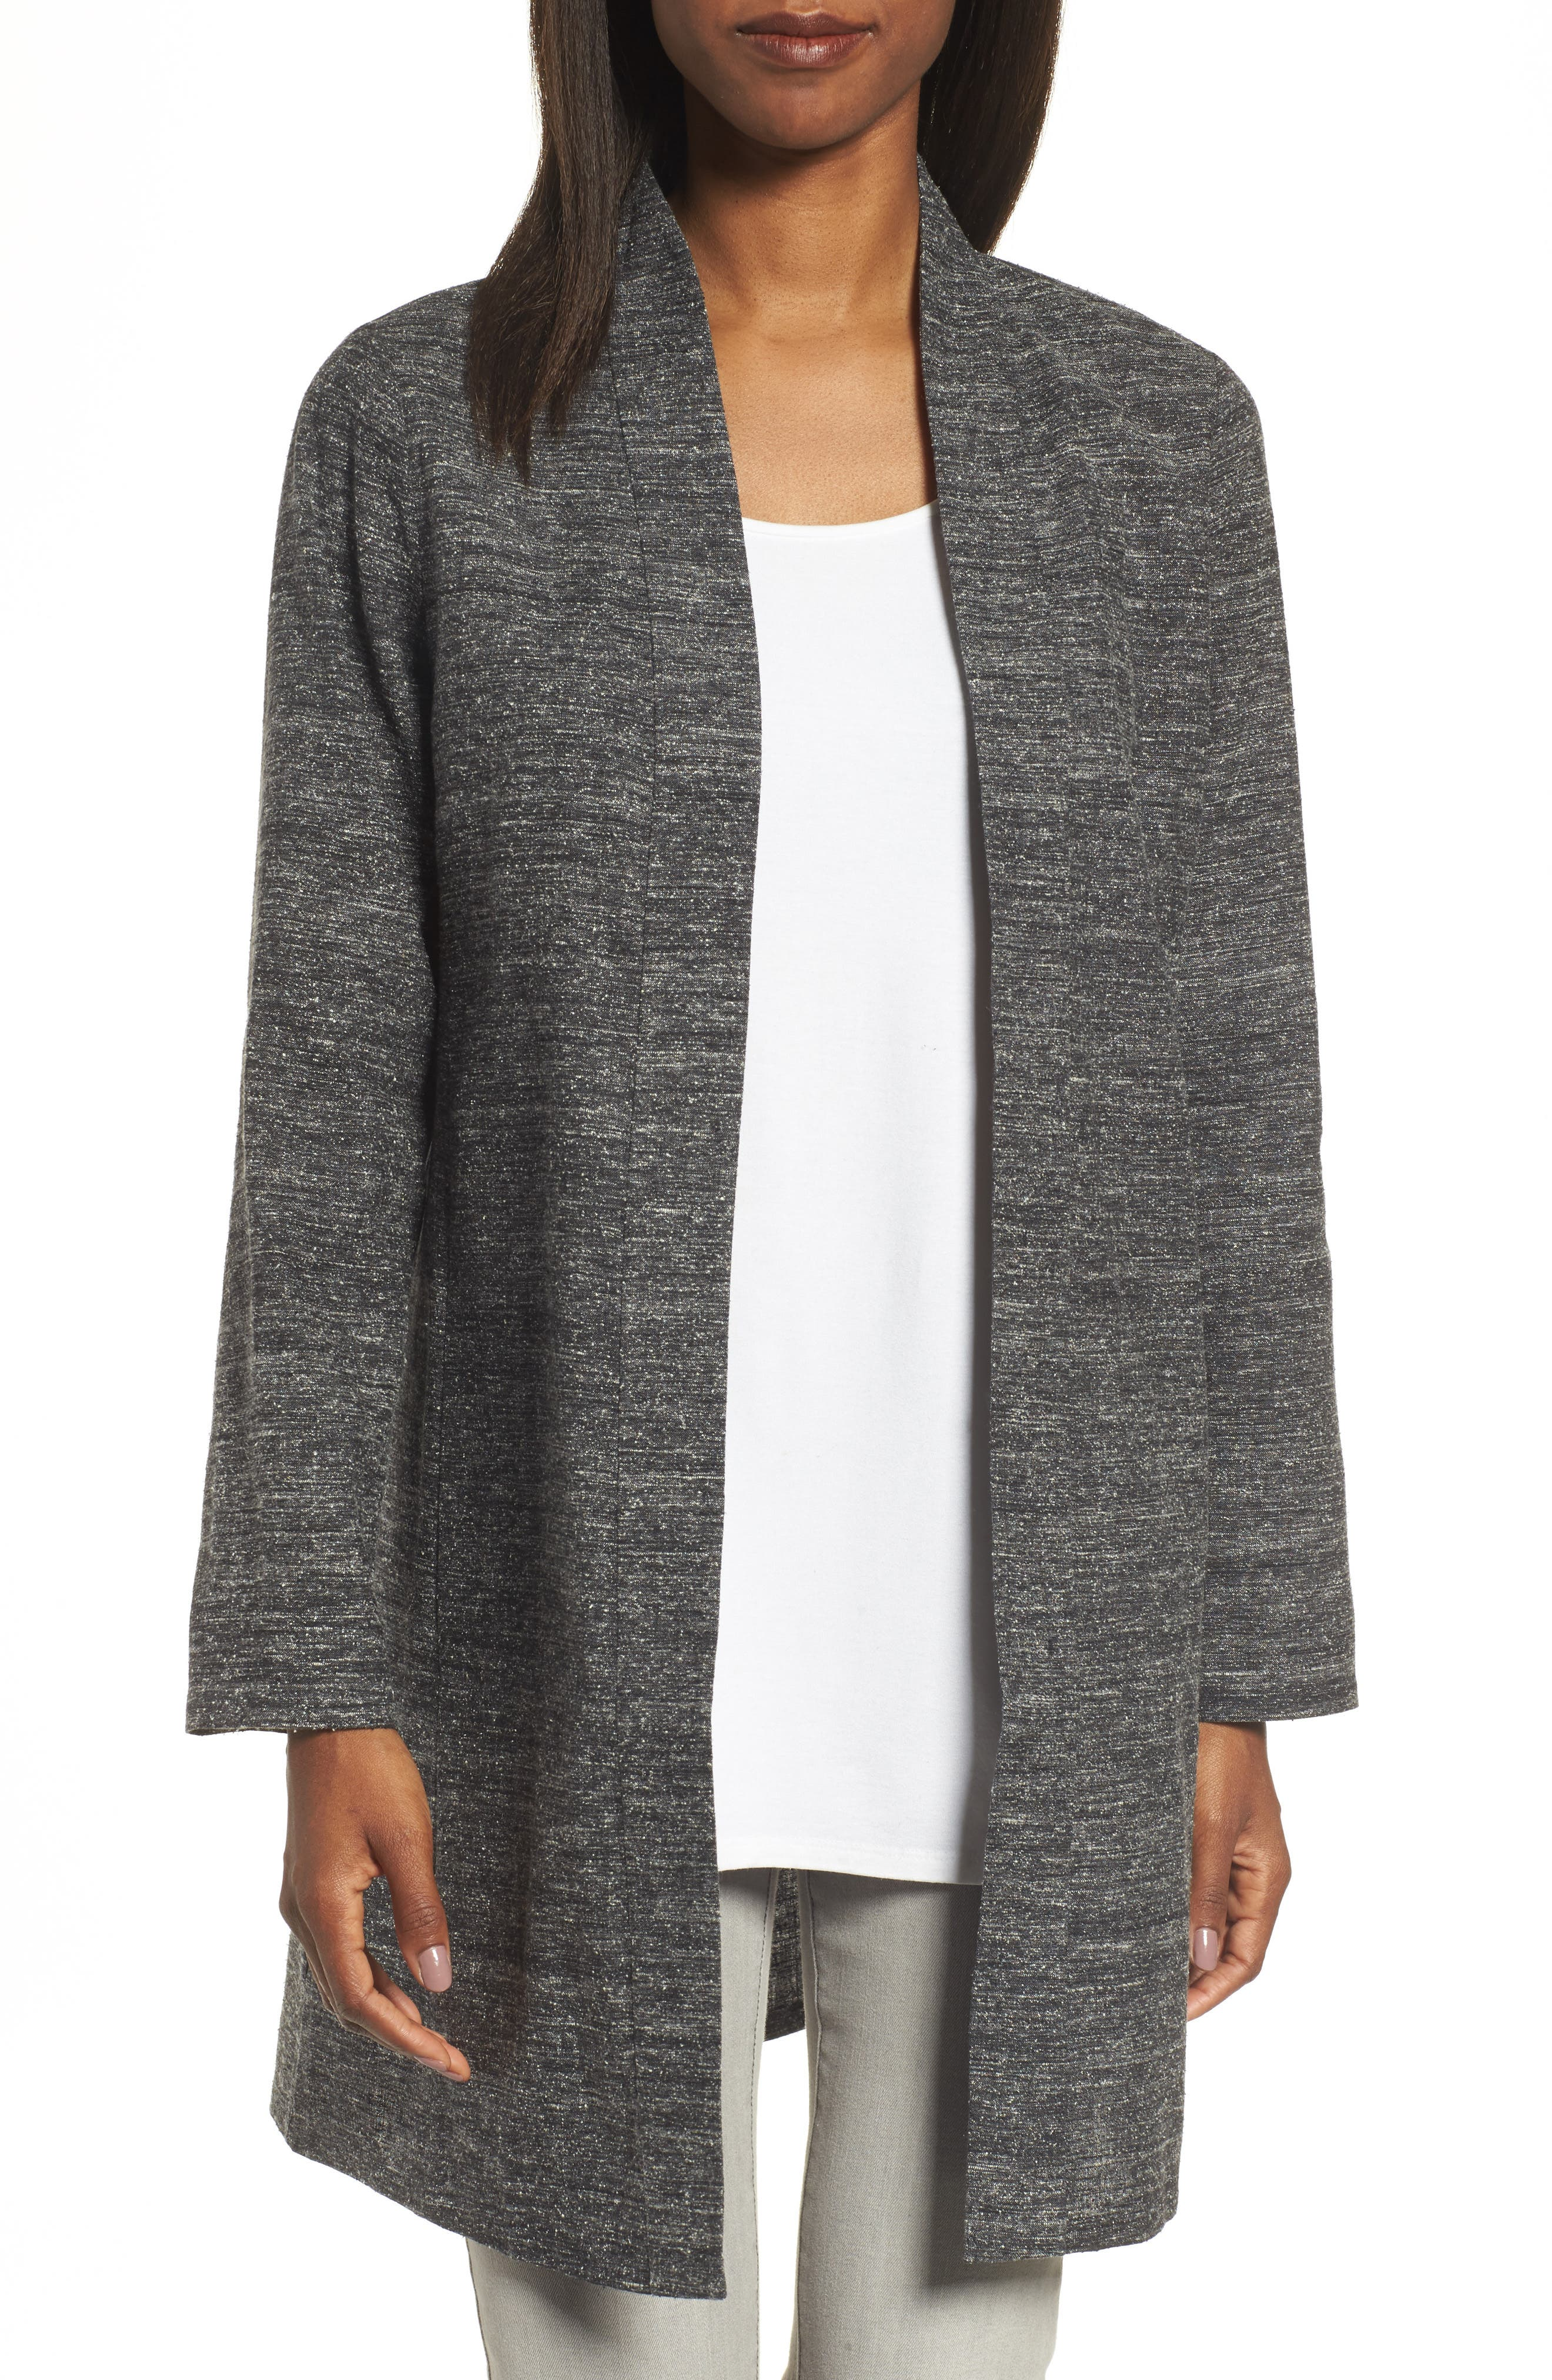 Alternate Image 1 Selected - Eileen Fisher Silk & Organic Linen Duster